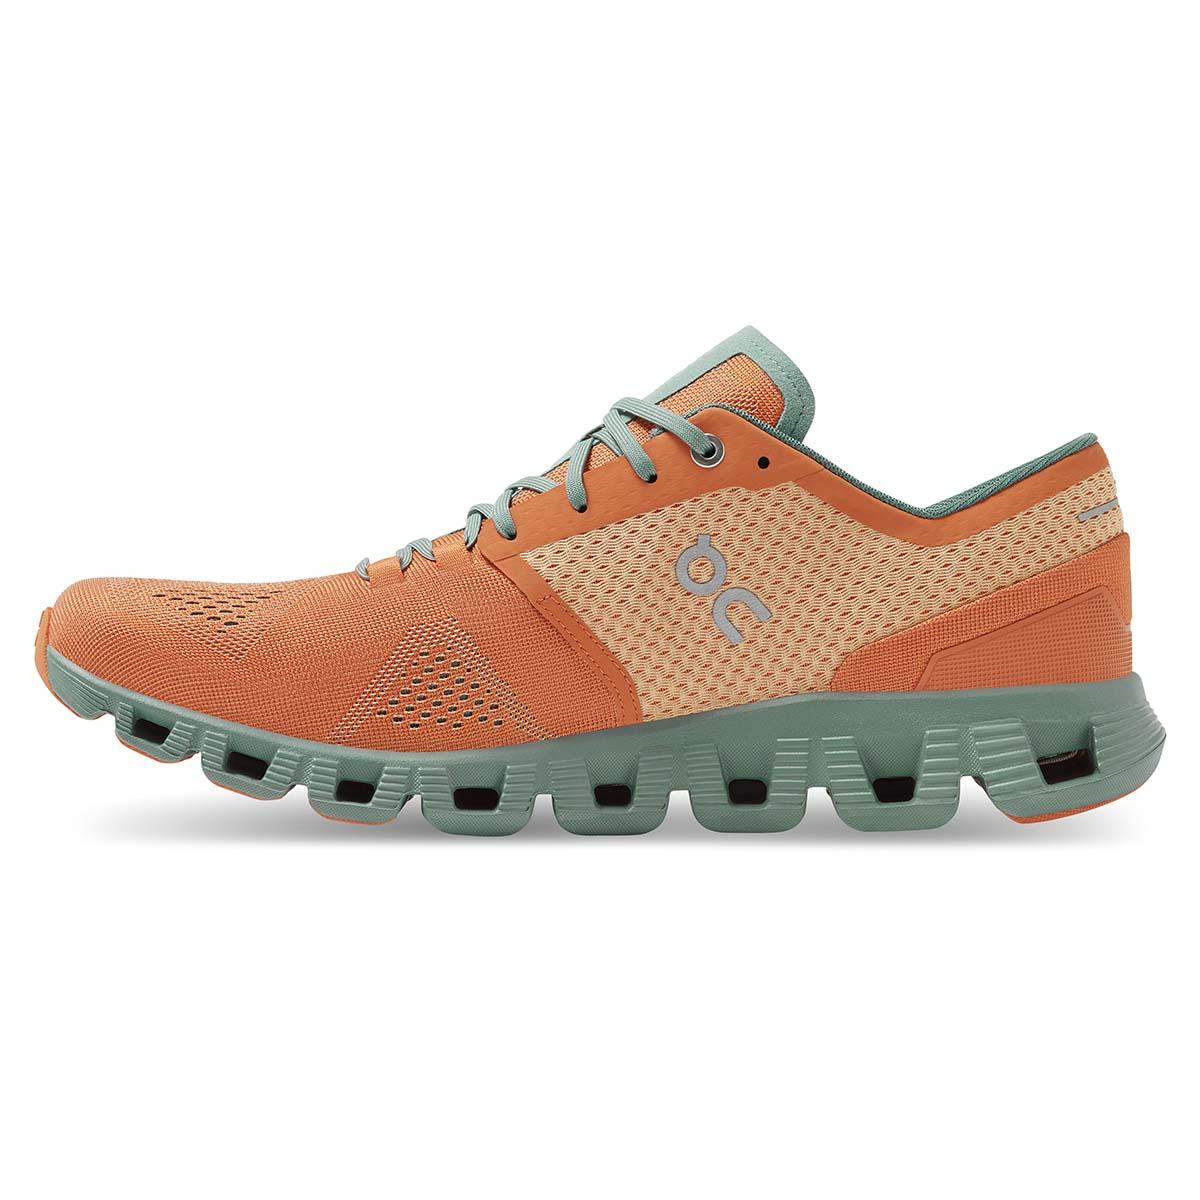 Men's On Cloud X 2.0 Running Shoe - Color: Orange/Sea - Size: 7 - Width: Regular, Orange/Sea, large, image 3